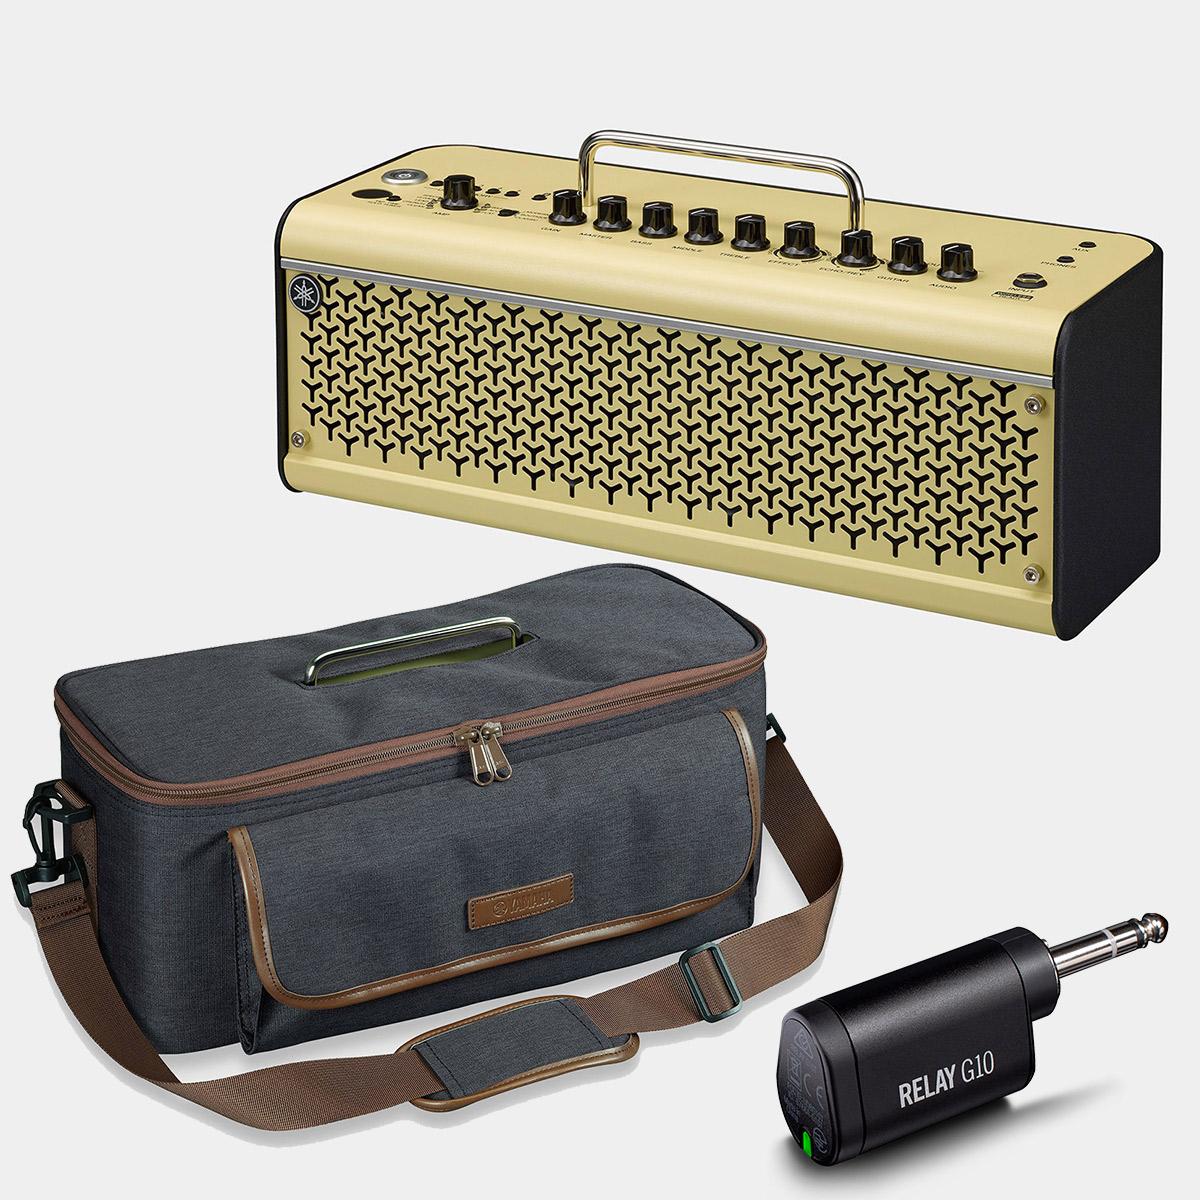 YAMAHA THR30II Wireless + Line 6 Relay G10T キャリングバッグセット 【ヤマハ】